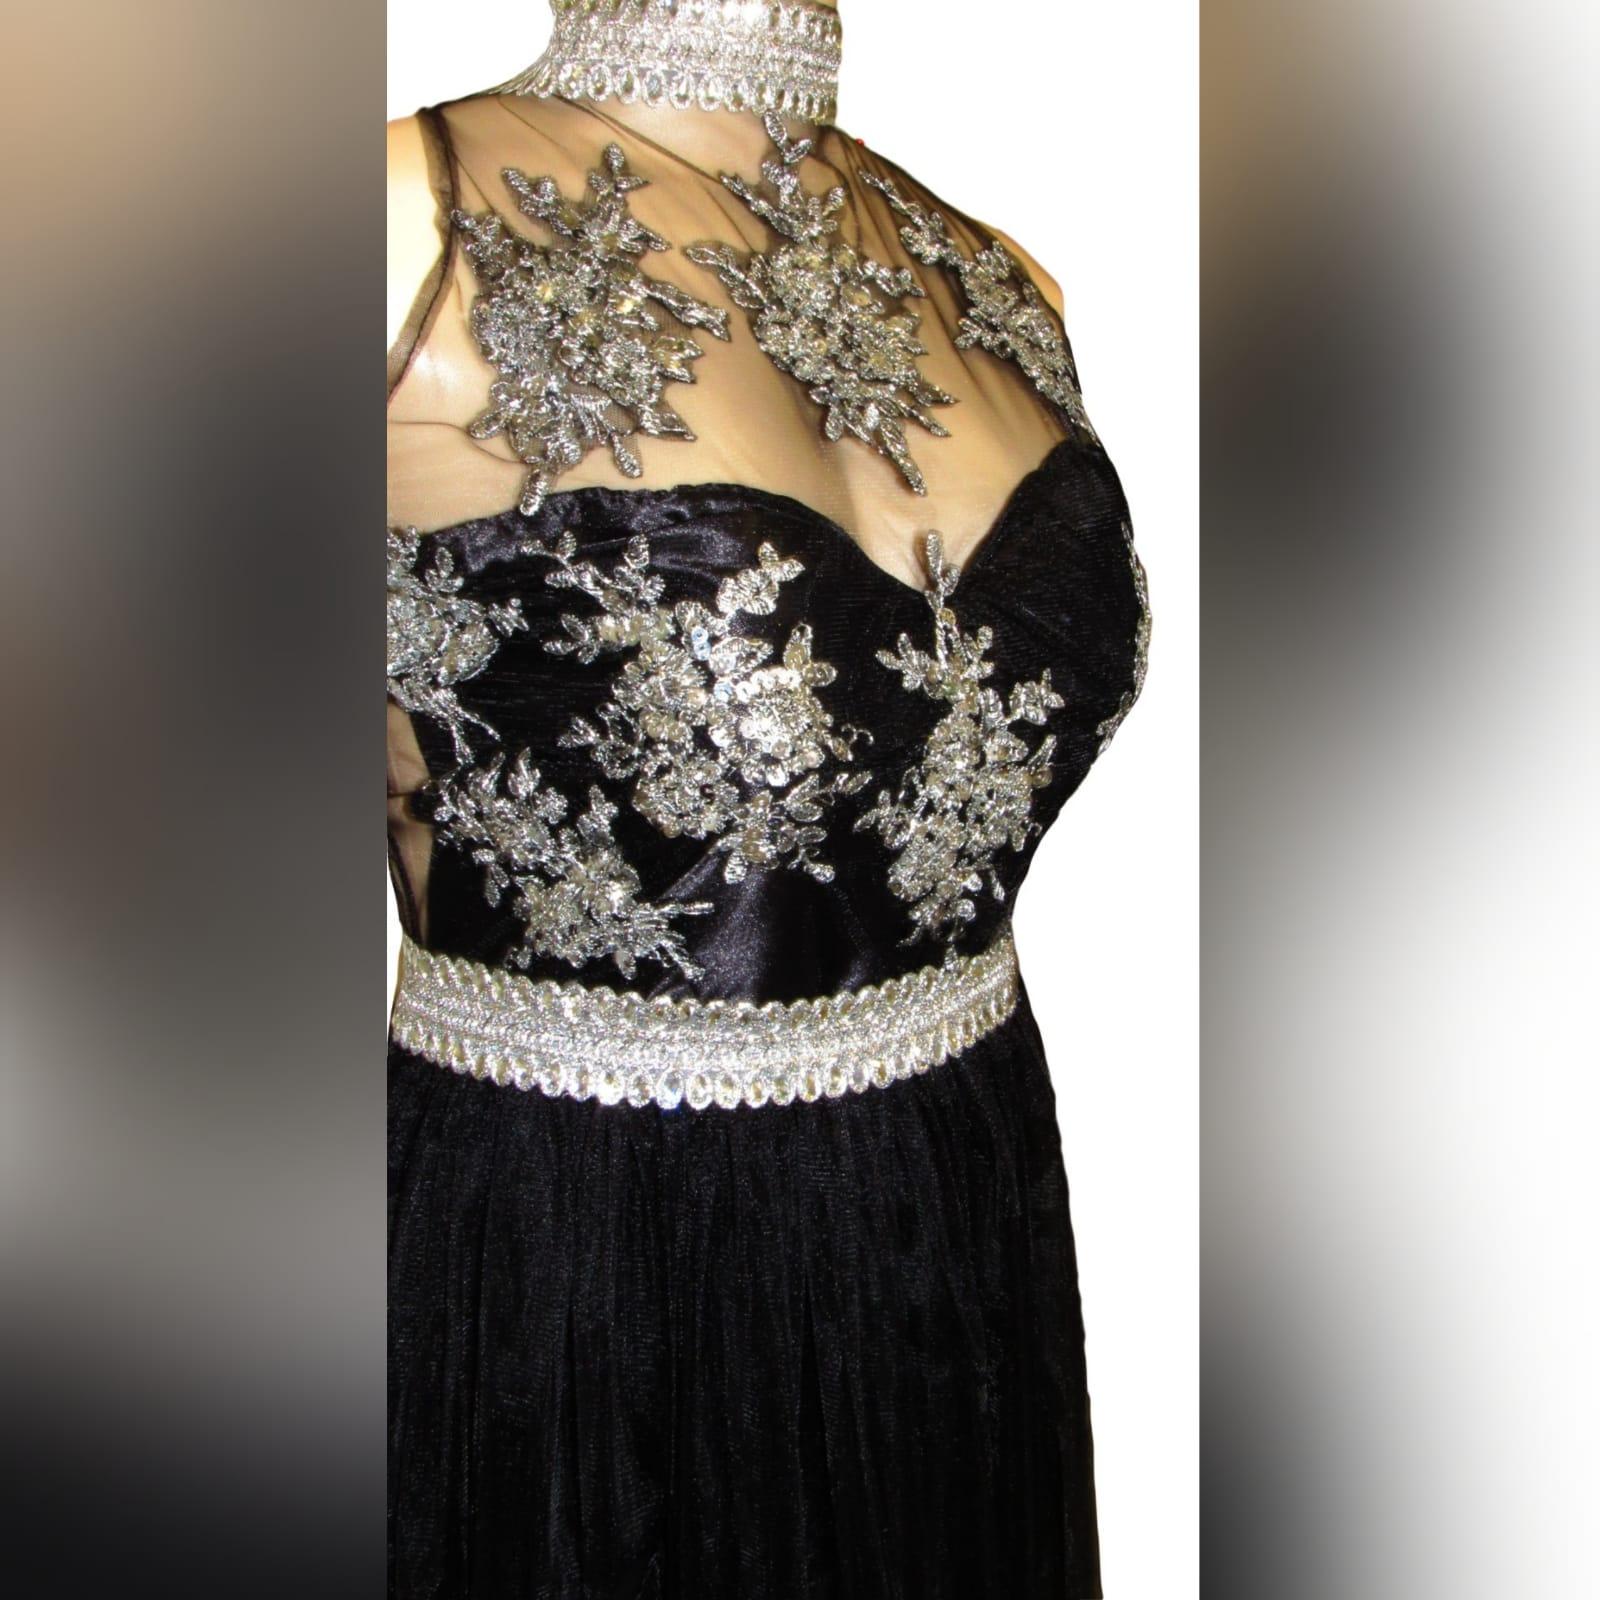 Black & silver long elegant prom dress 2 black & silver, long & elegant prom dance dress with a triangular open back. Choker neckline and an under bust bling belt with train.